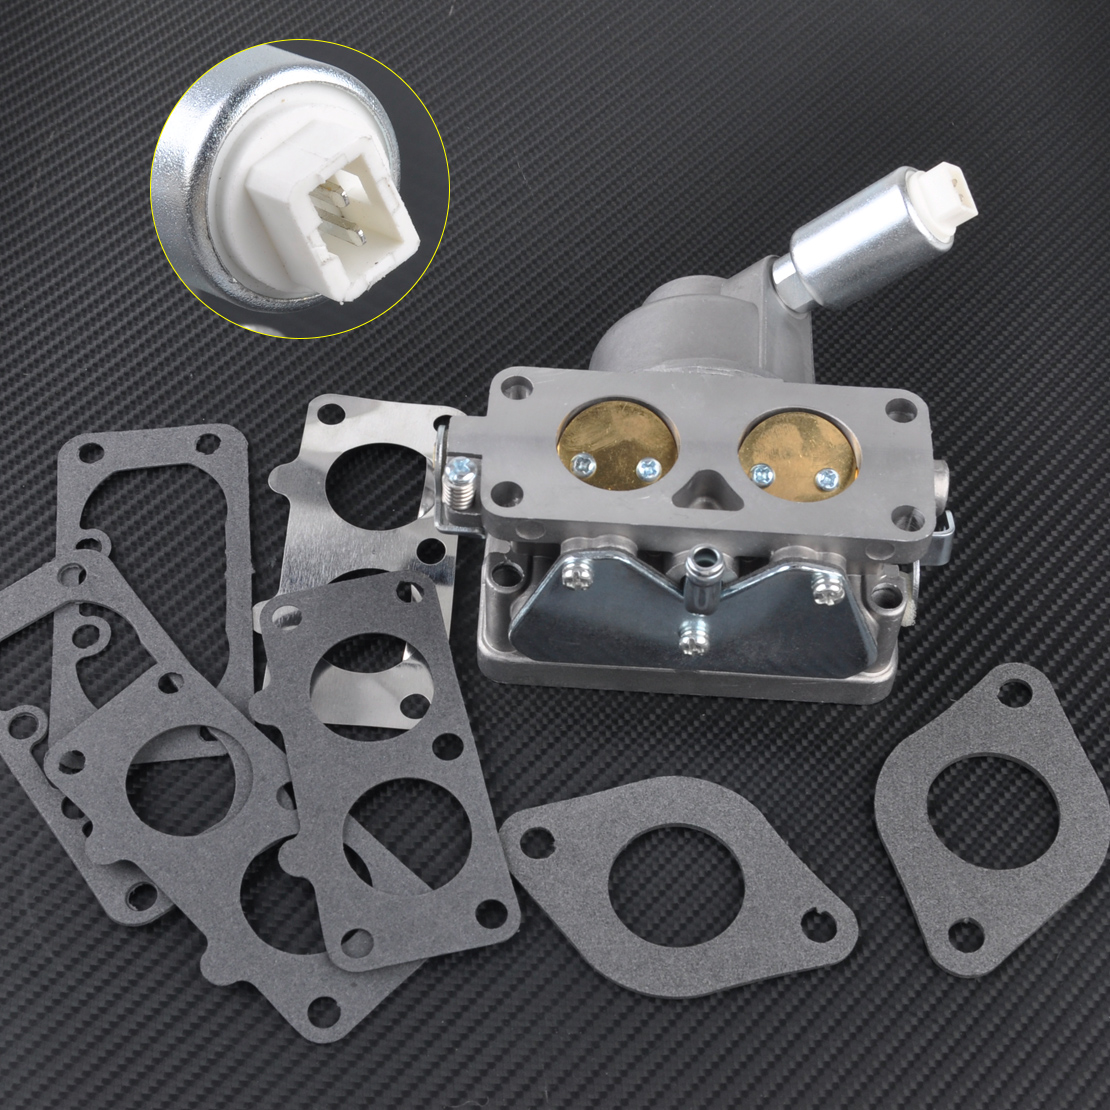 цена на LETAOSK New Carburetor Replaces fit for Briggs & Stratton 791230 699709 499804 Manual Choke